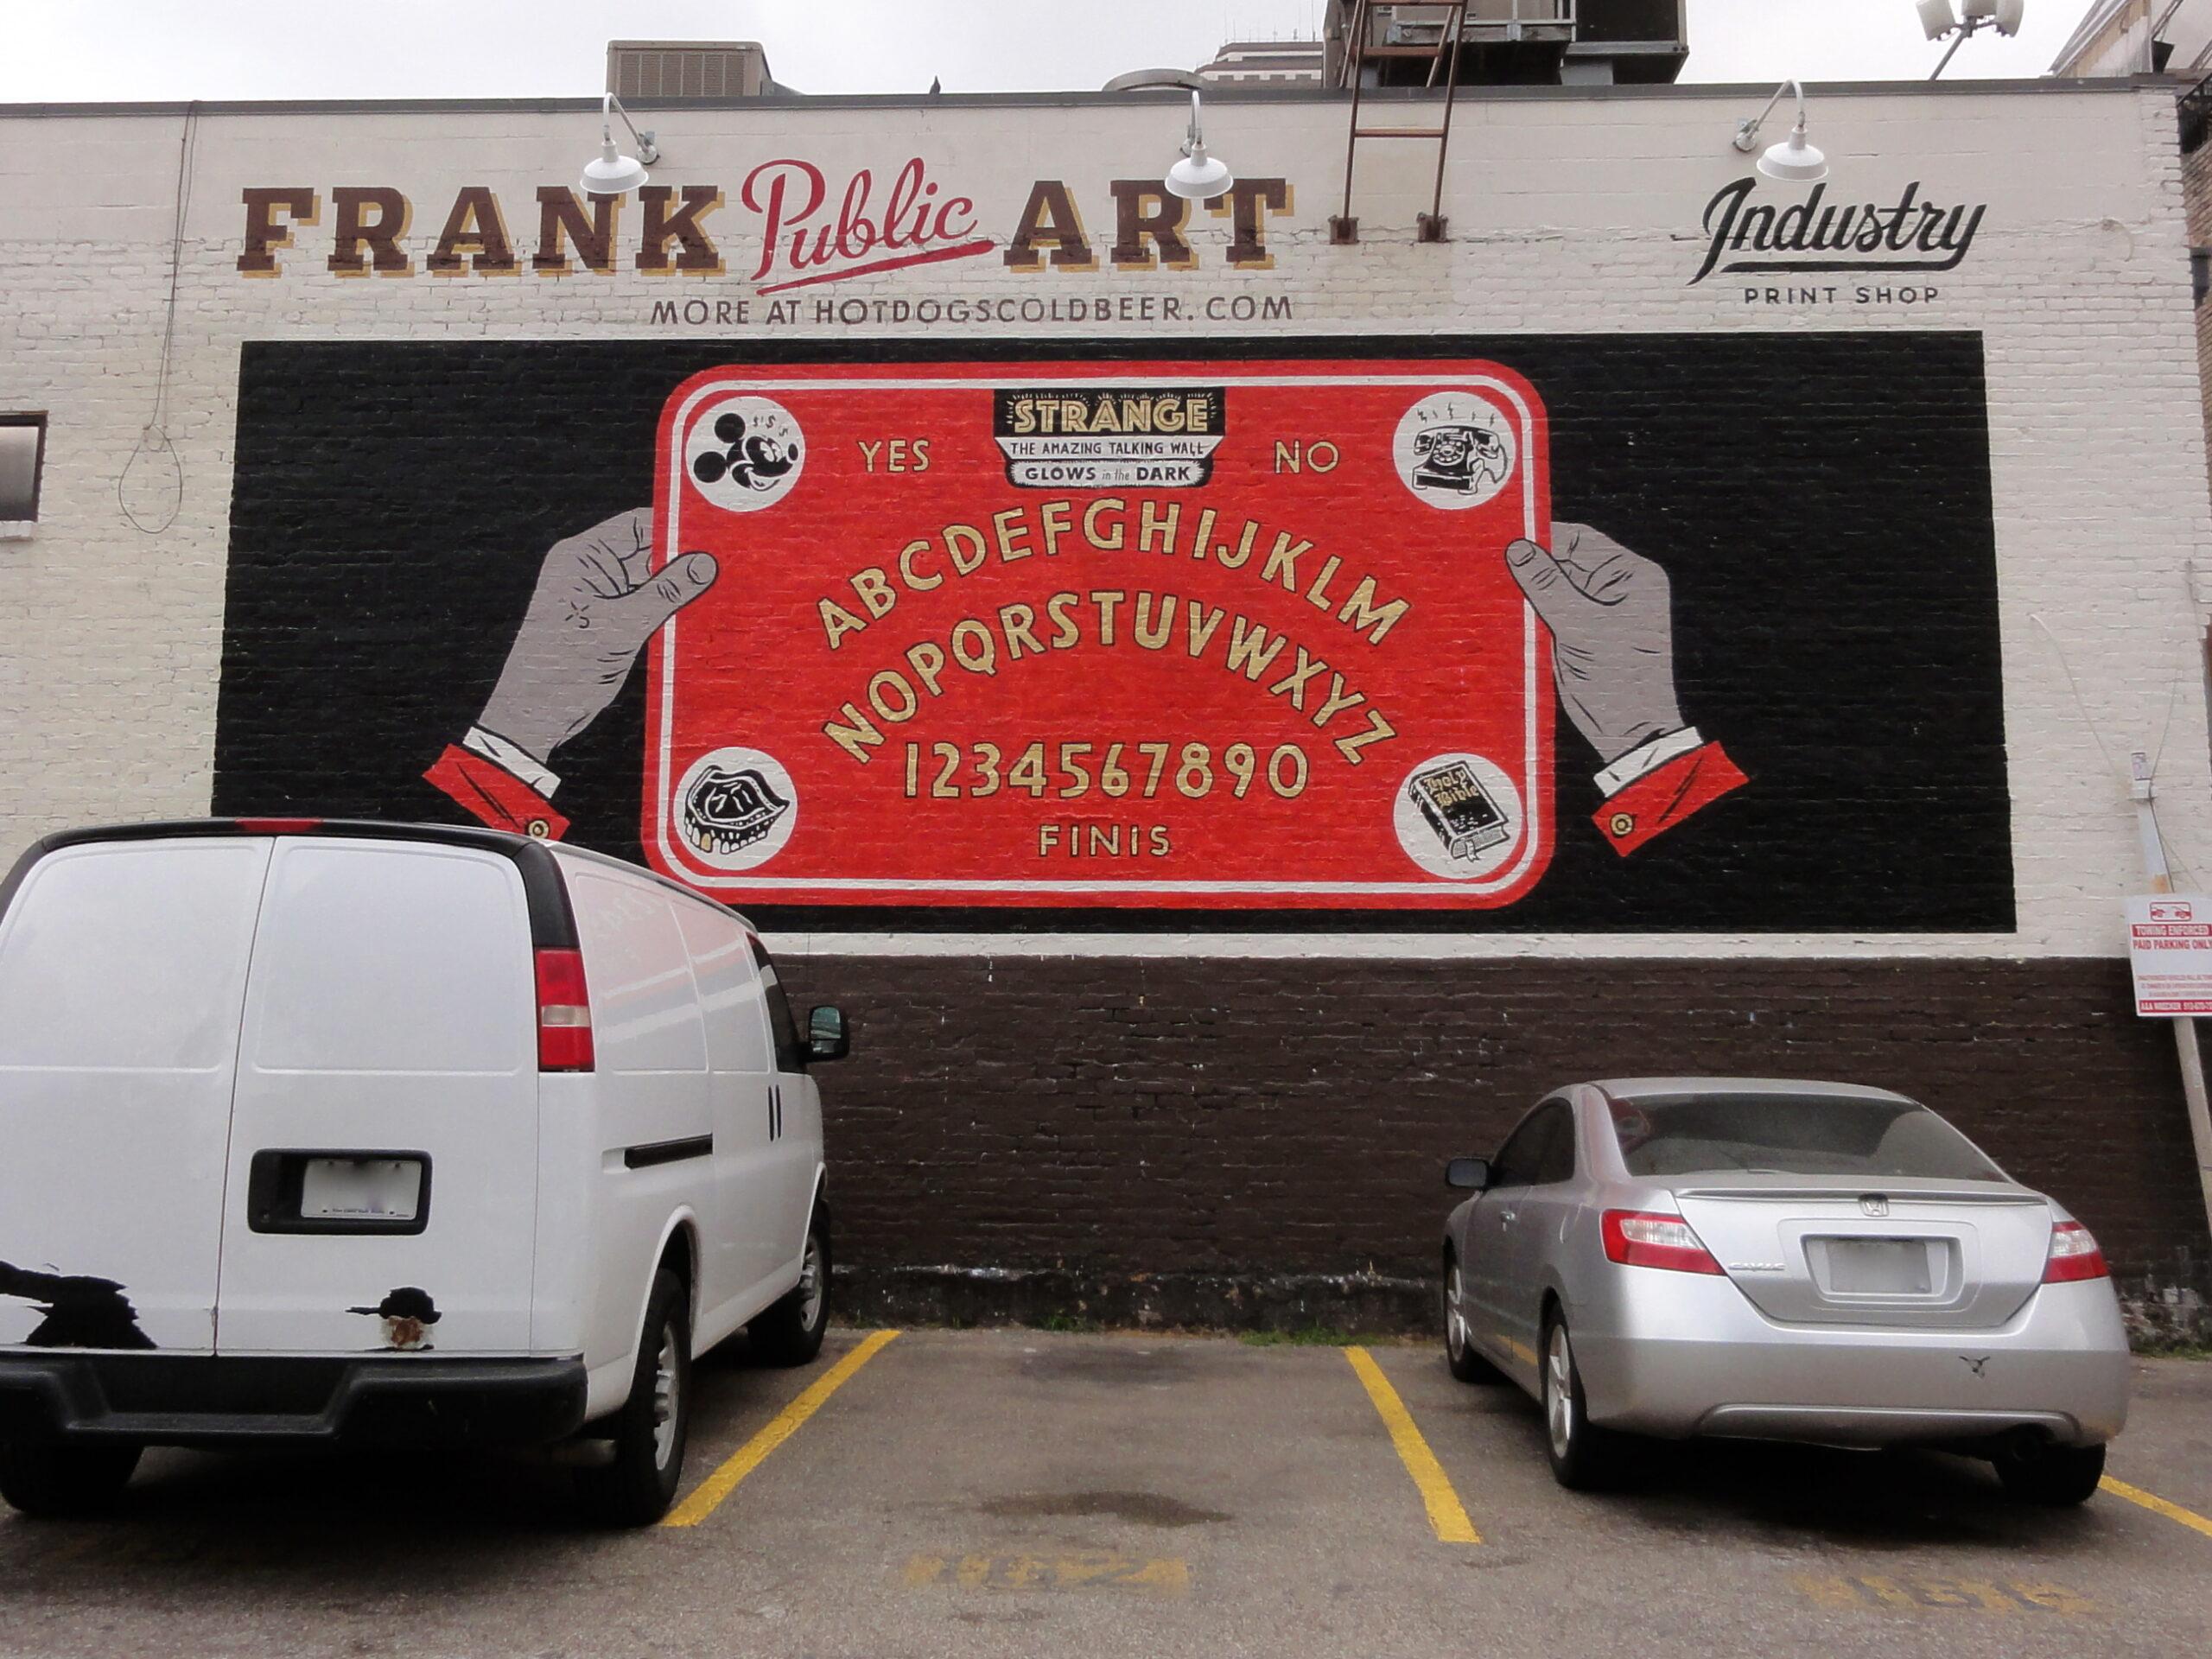 Frank Mural